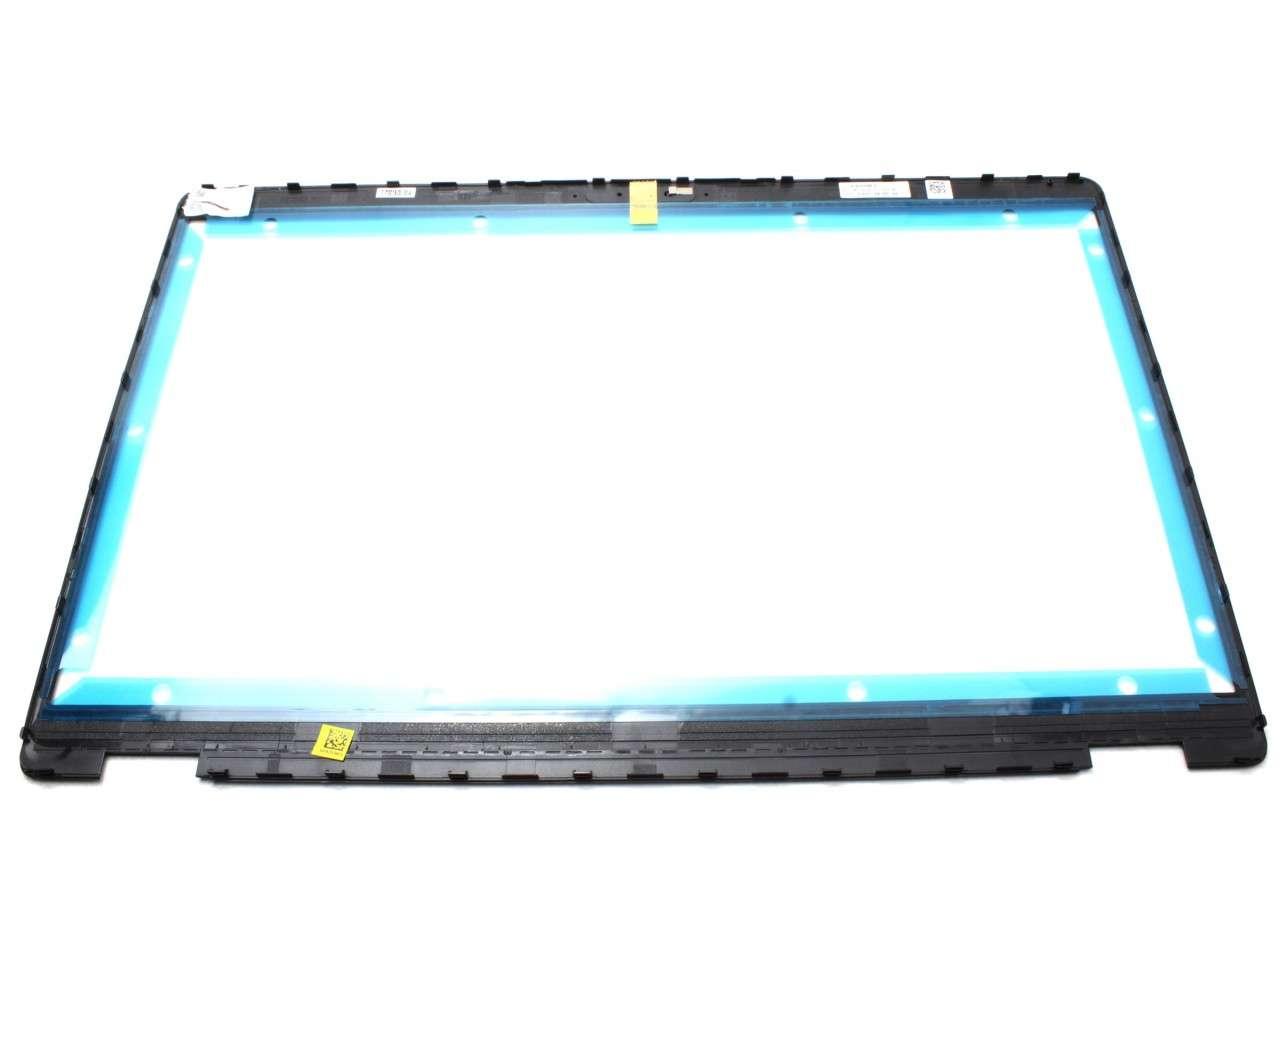 Rama Display Dell PYH4J Bezel Front Cover Neagra imagine powerlaptop.ro 2021